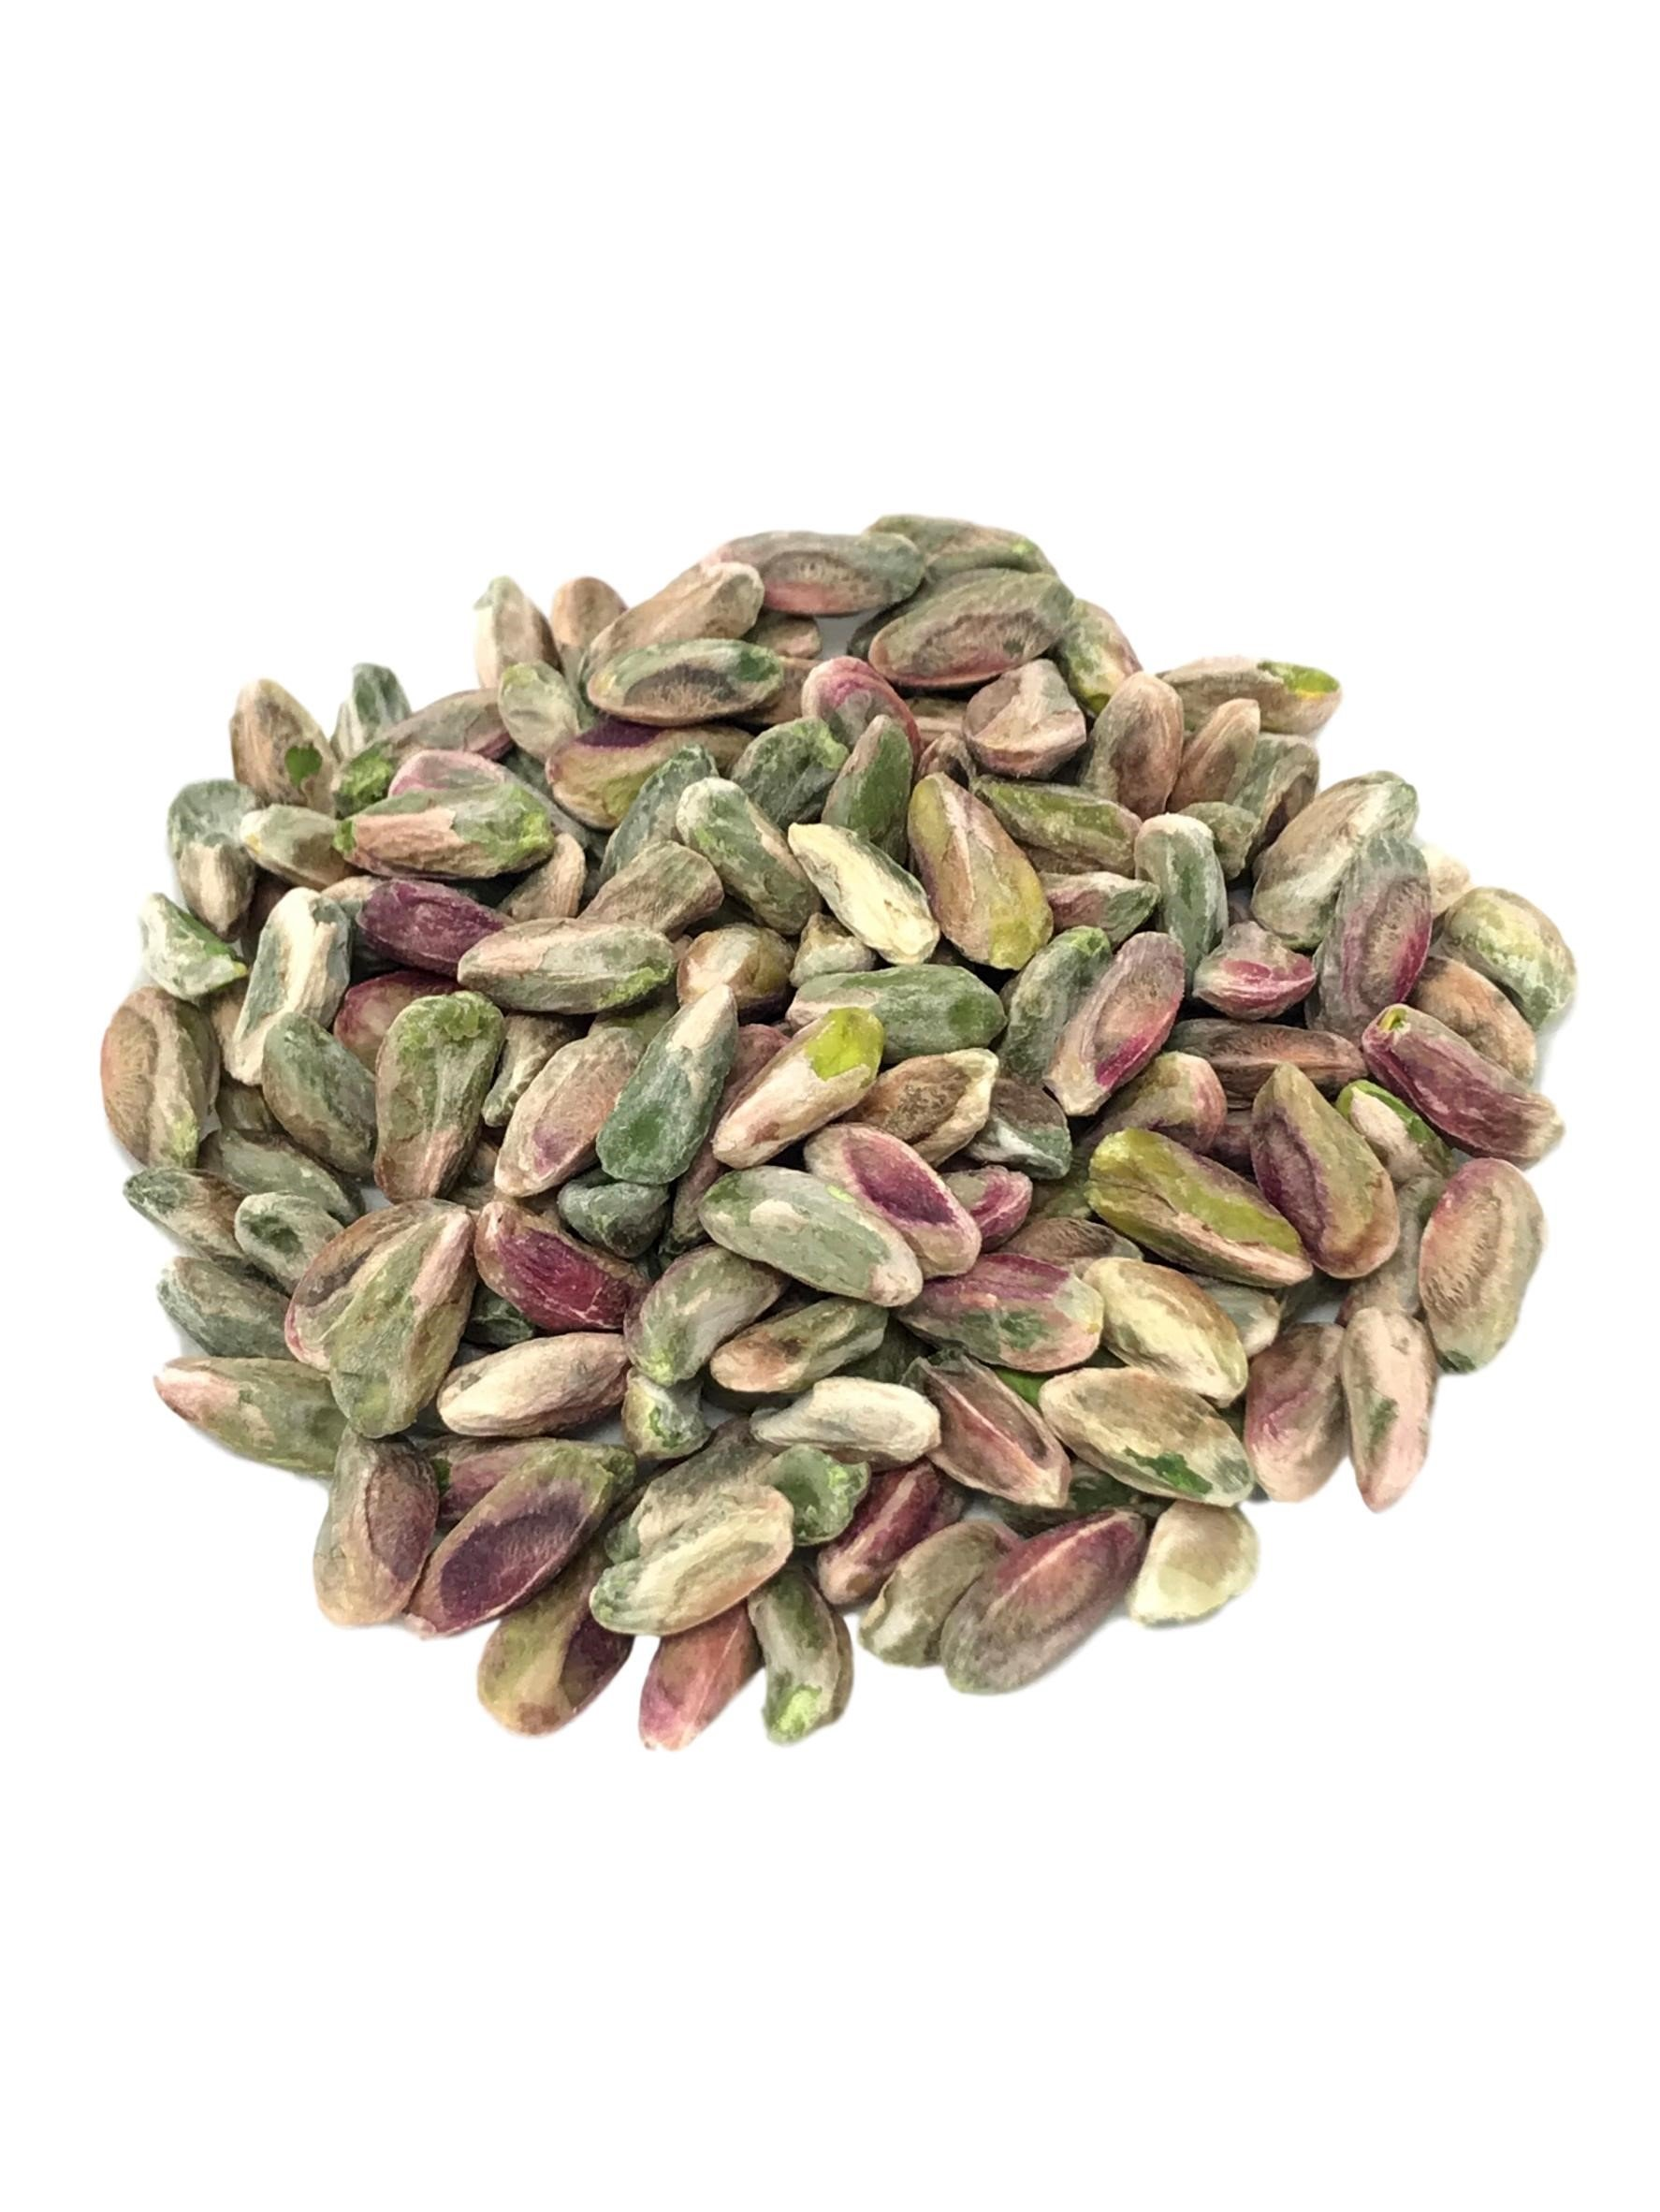 Amazon.com : NUTS U.S. - Almonds, Raw, Whole, Unsalted (3 ...